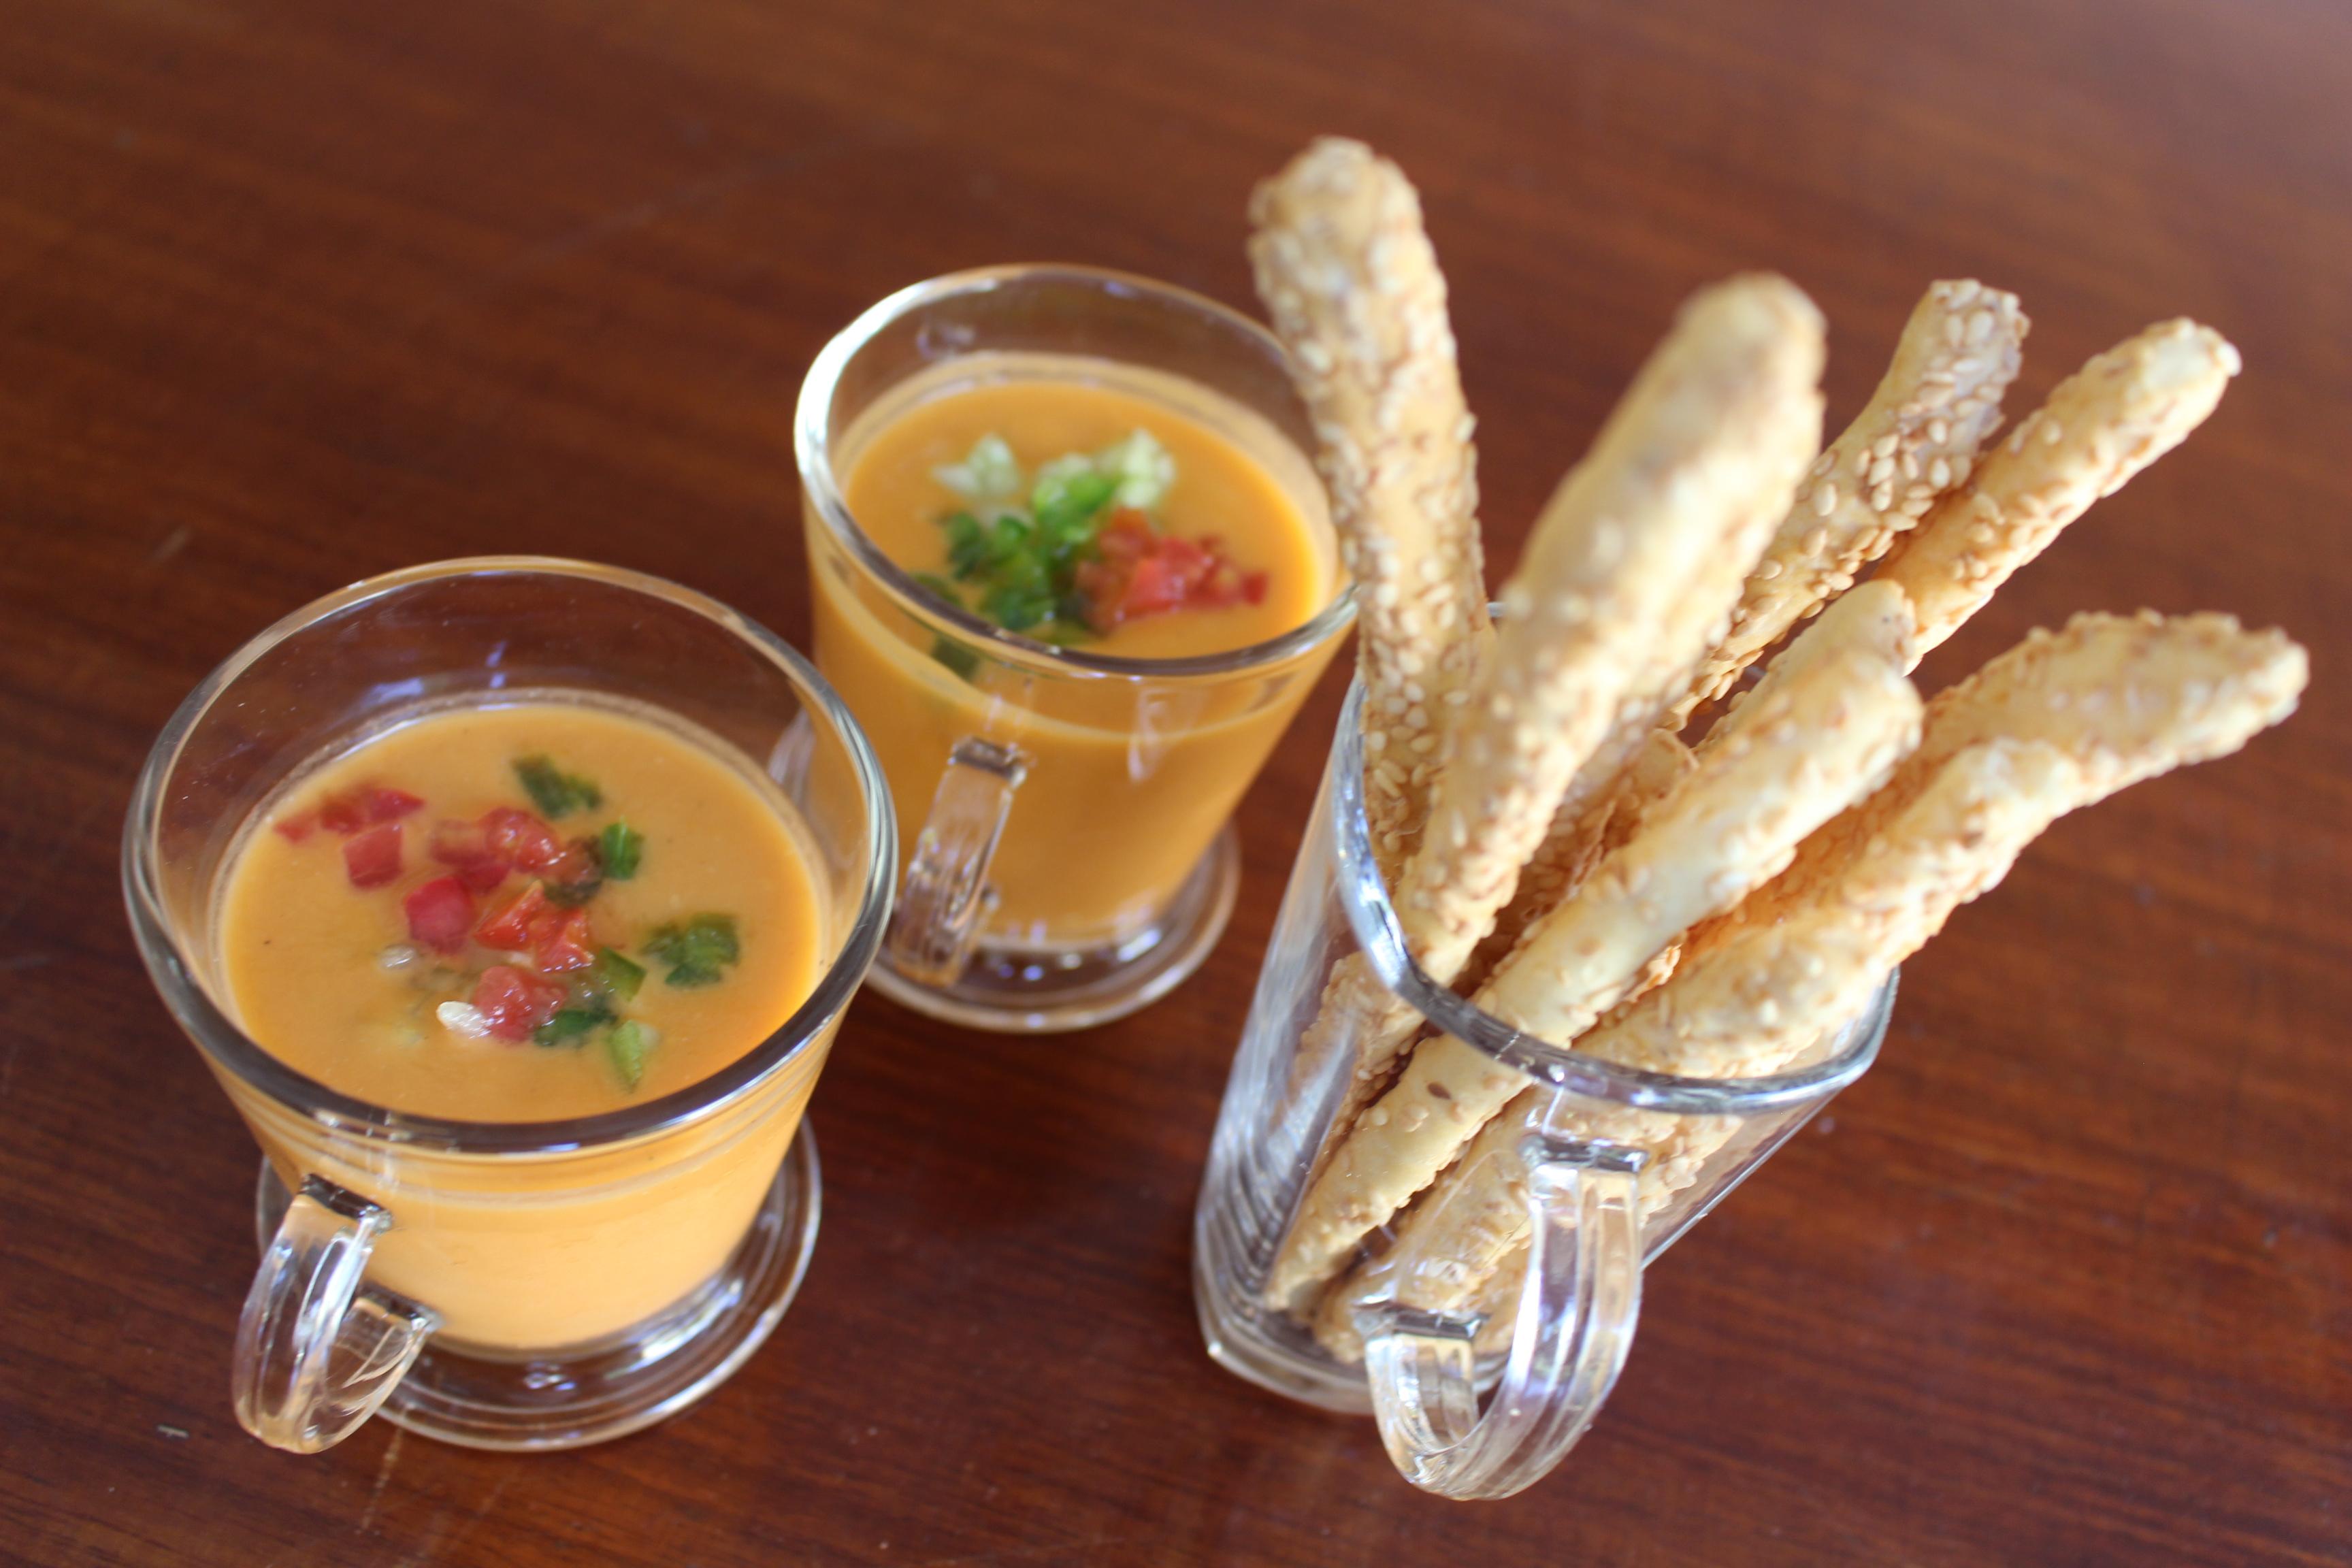 Gazpacho - Refrescante sopa fria